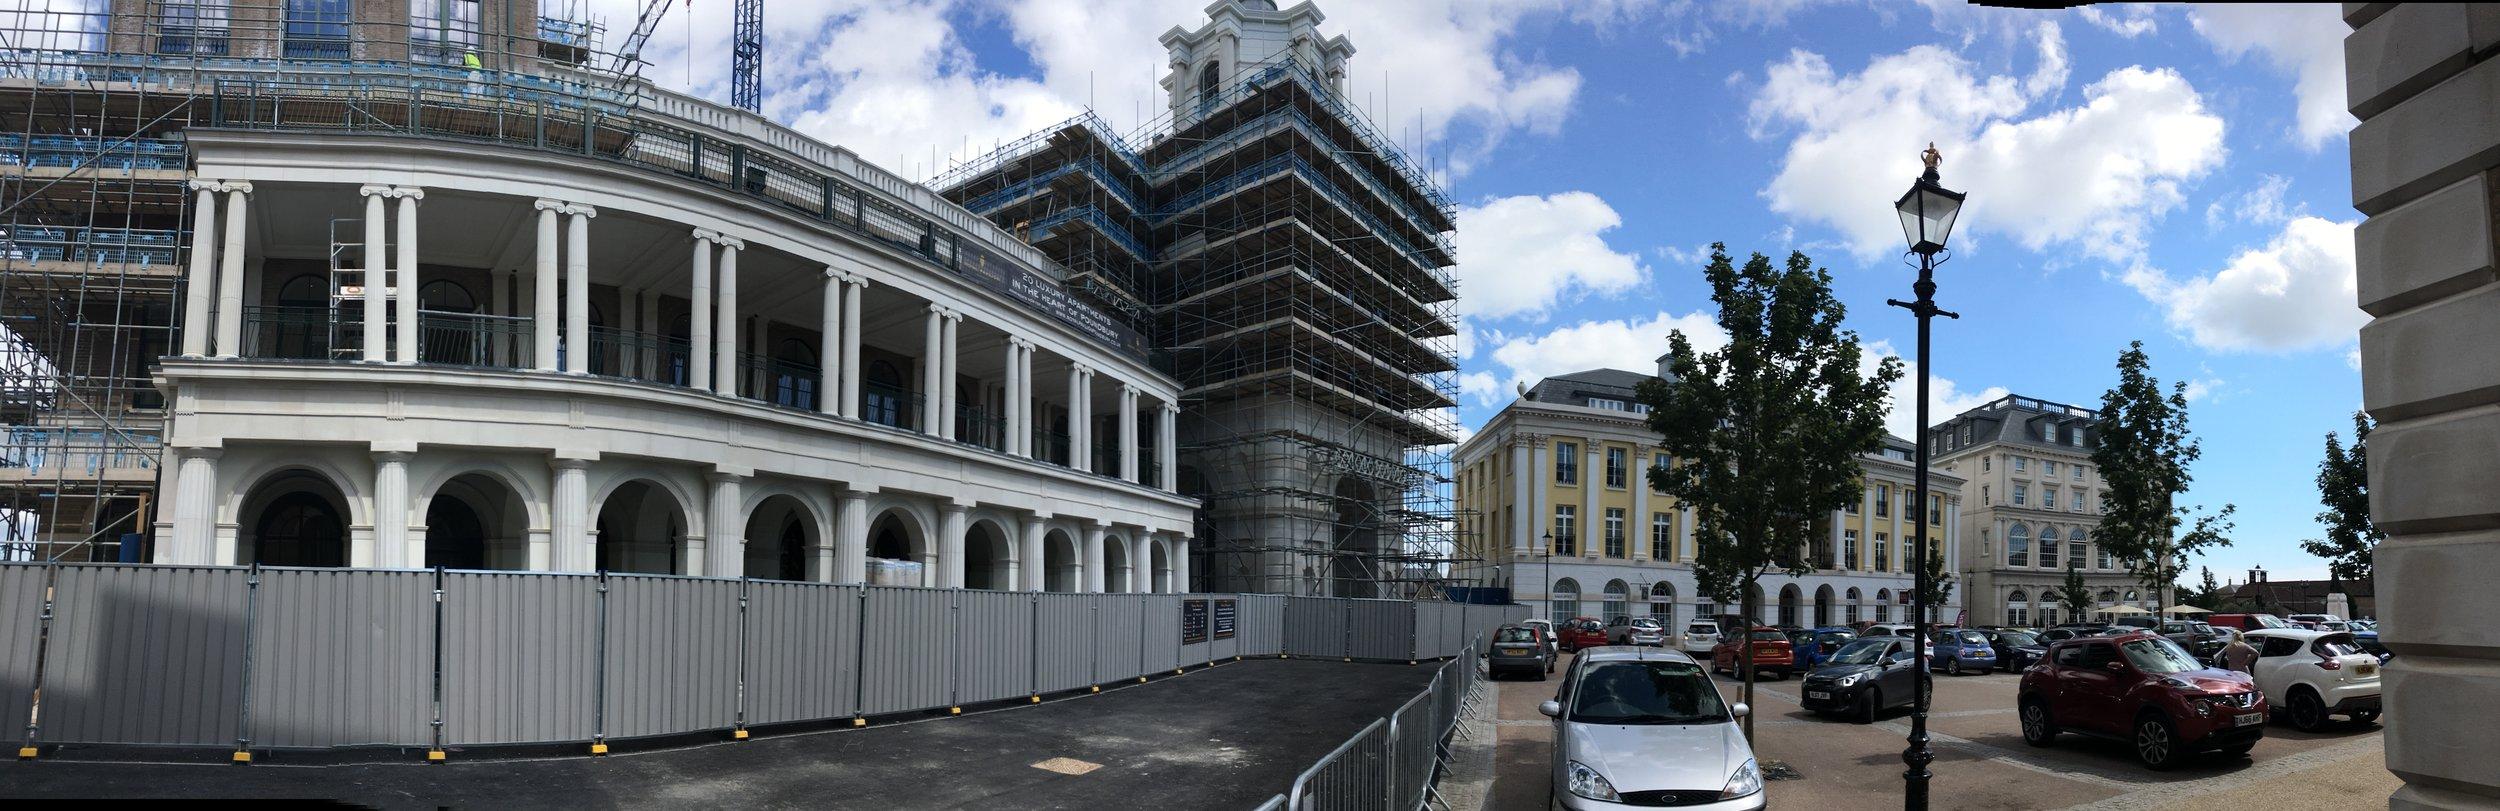 Poundbury- queen mother square.